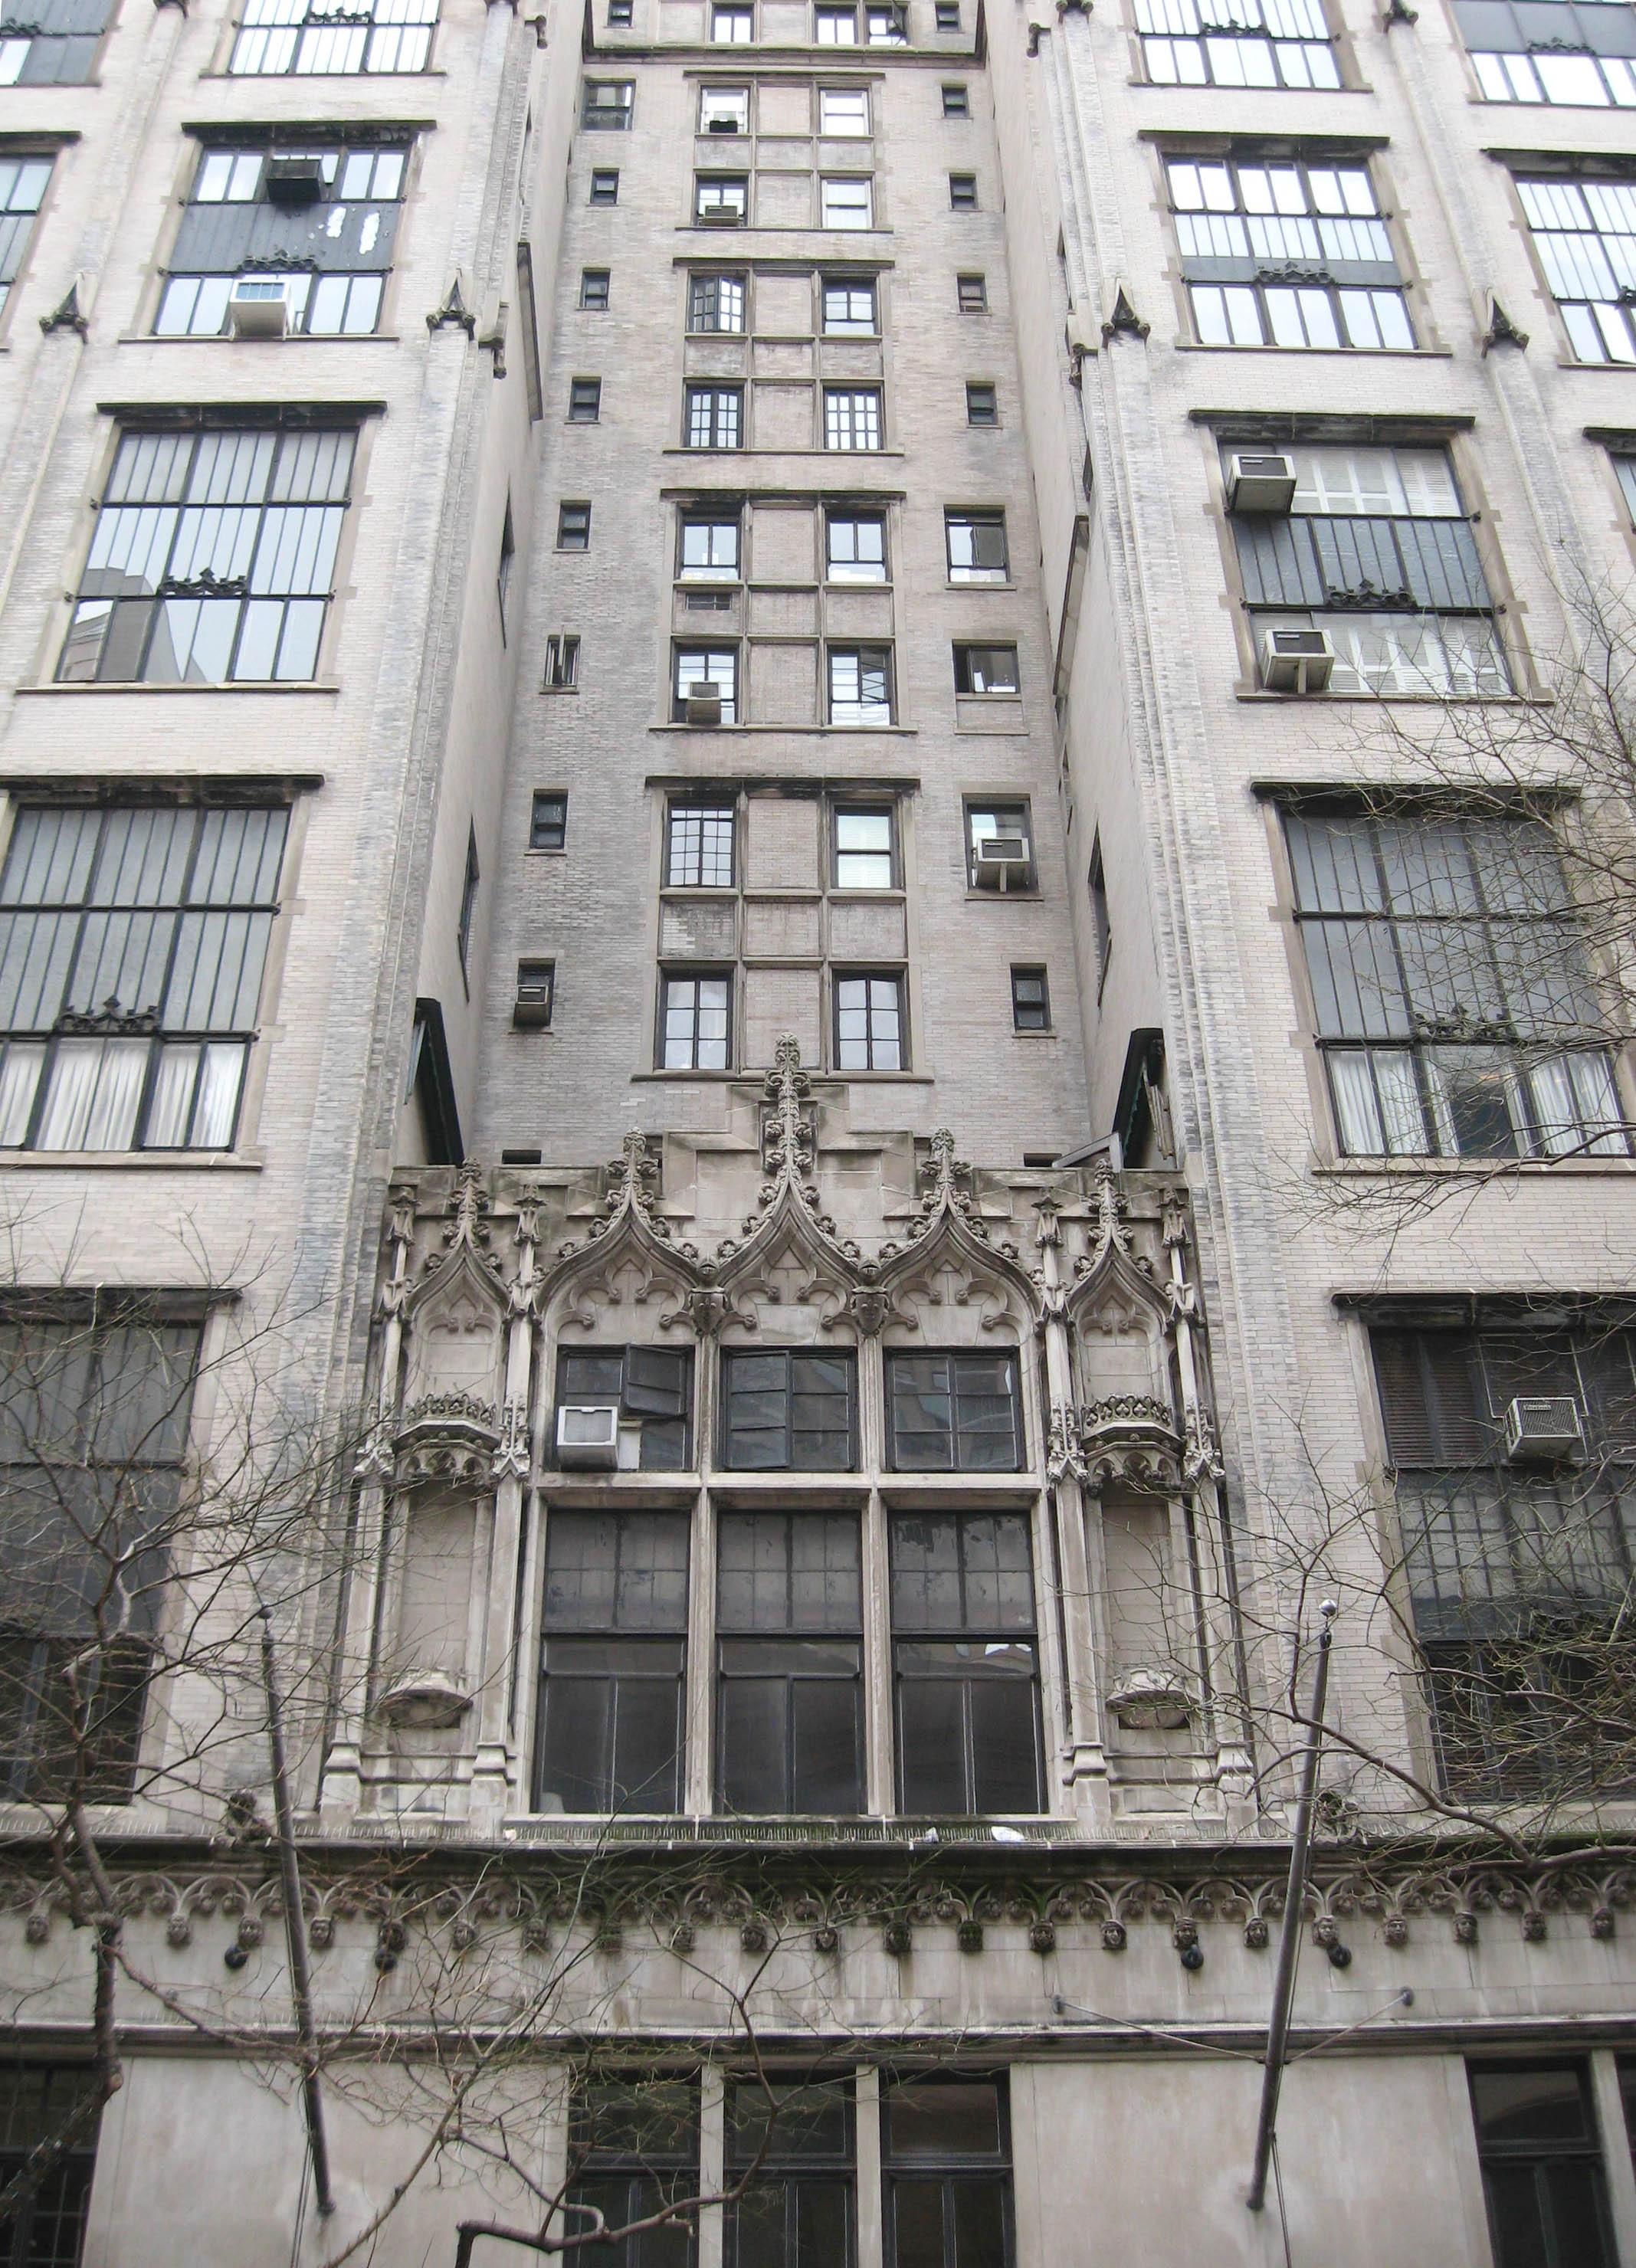 NEO-GOTHIC...The impressive facade of Hotel des Artistes